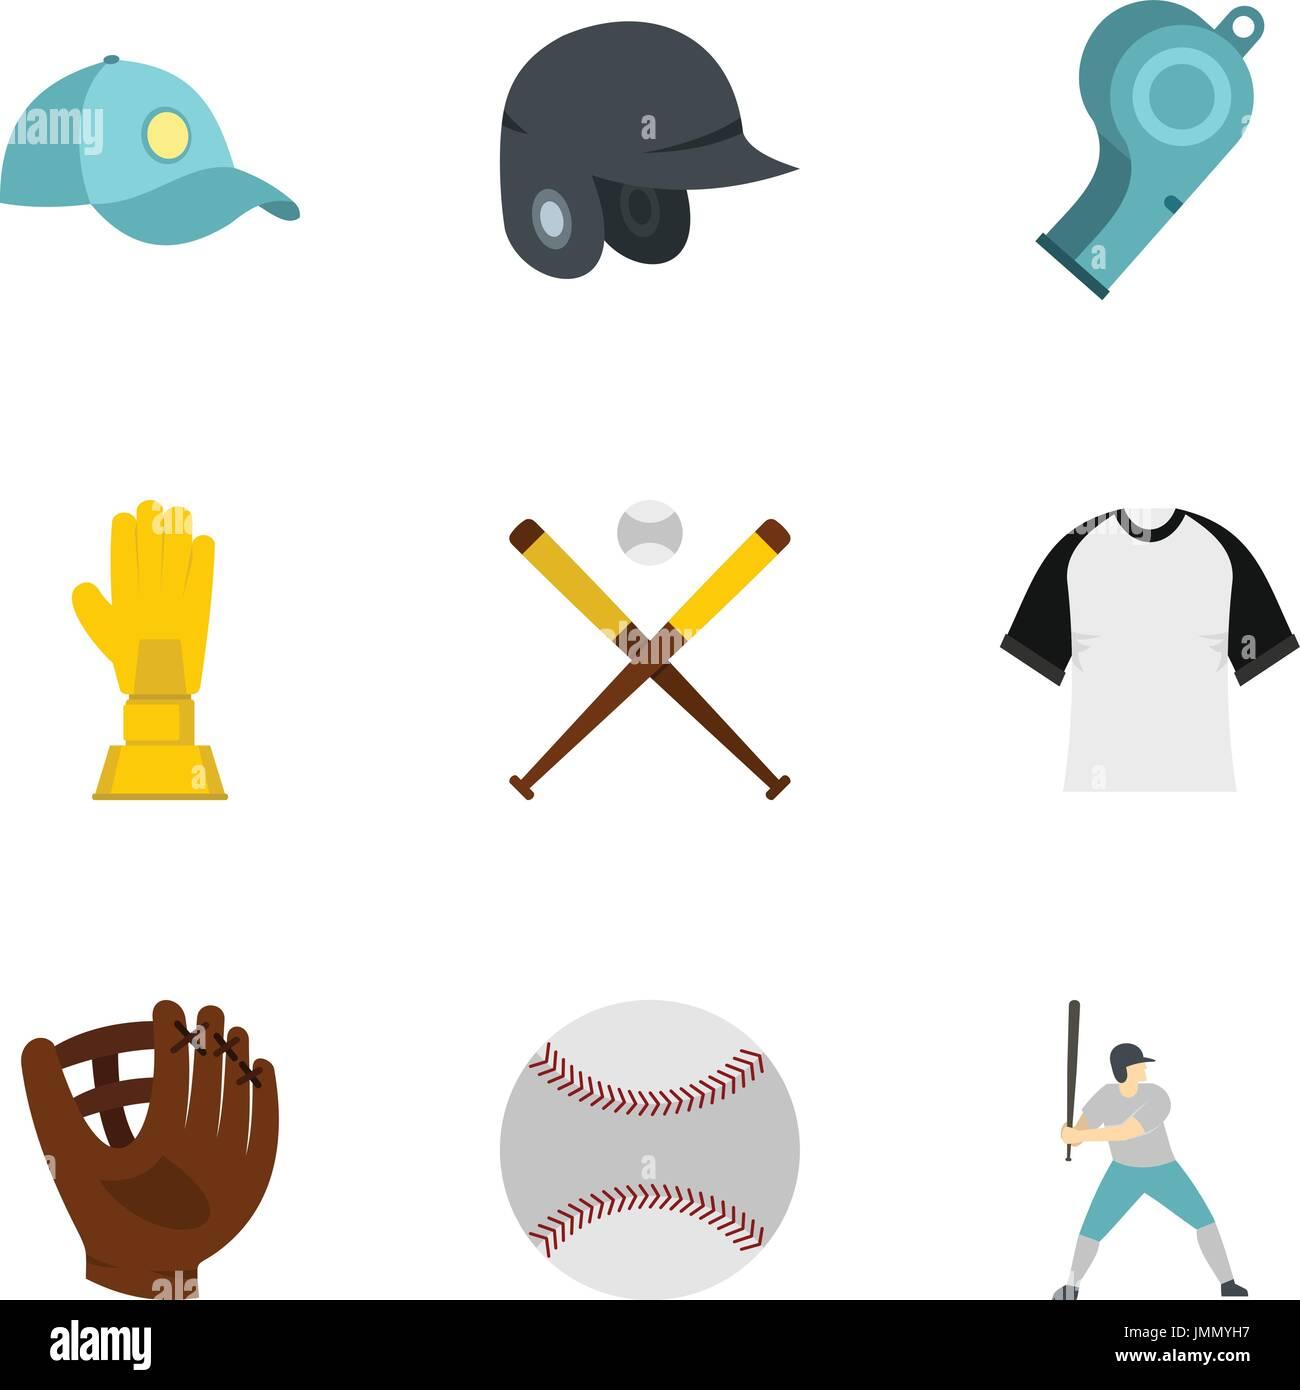 Baseball Goods Stock Photos   Baseball Goods Stock Images - Alamy a94b1f8ffd93